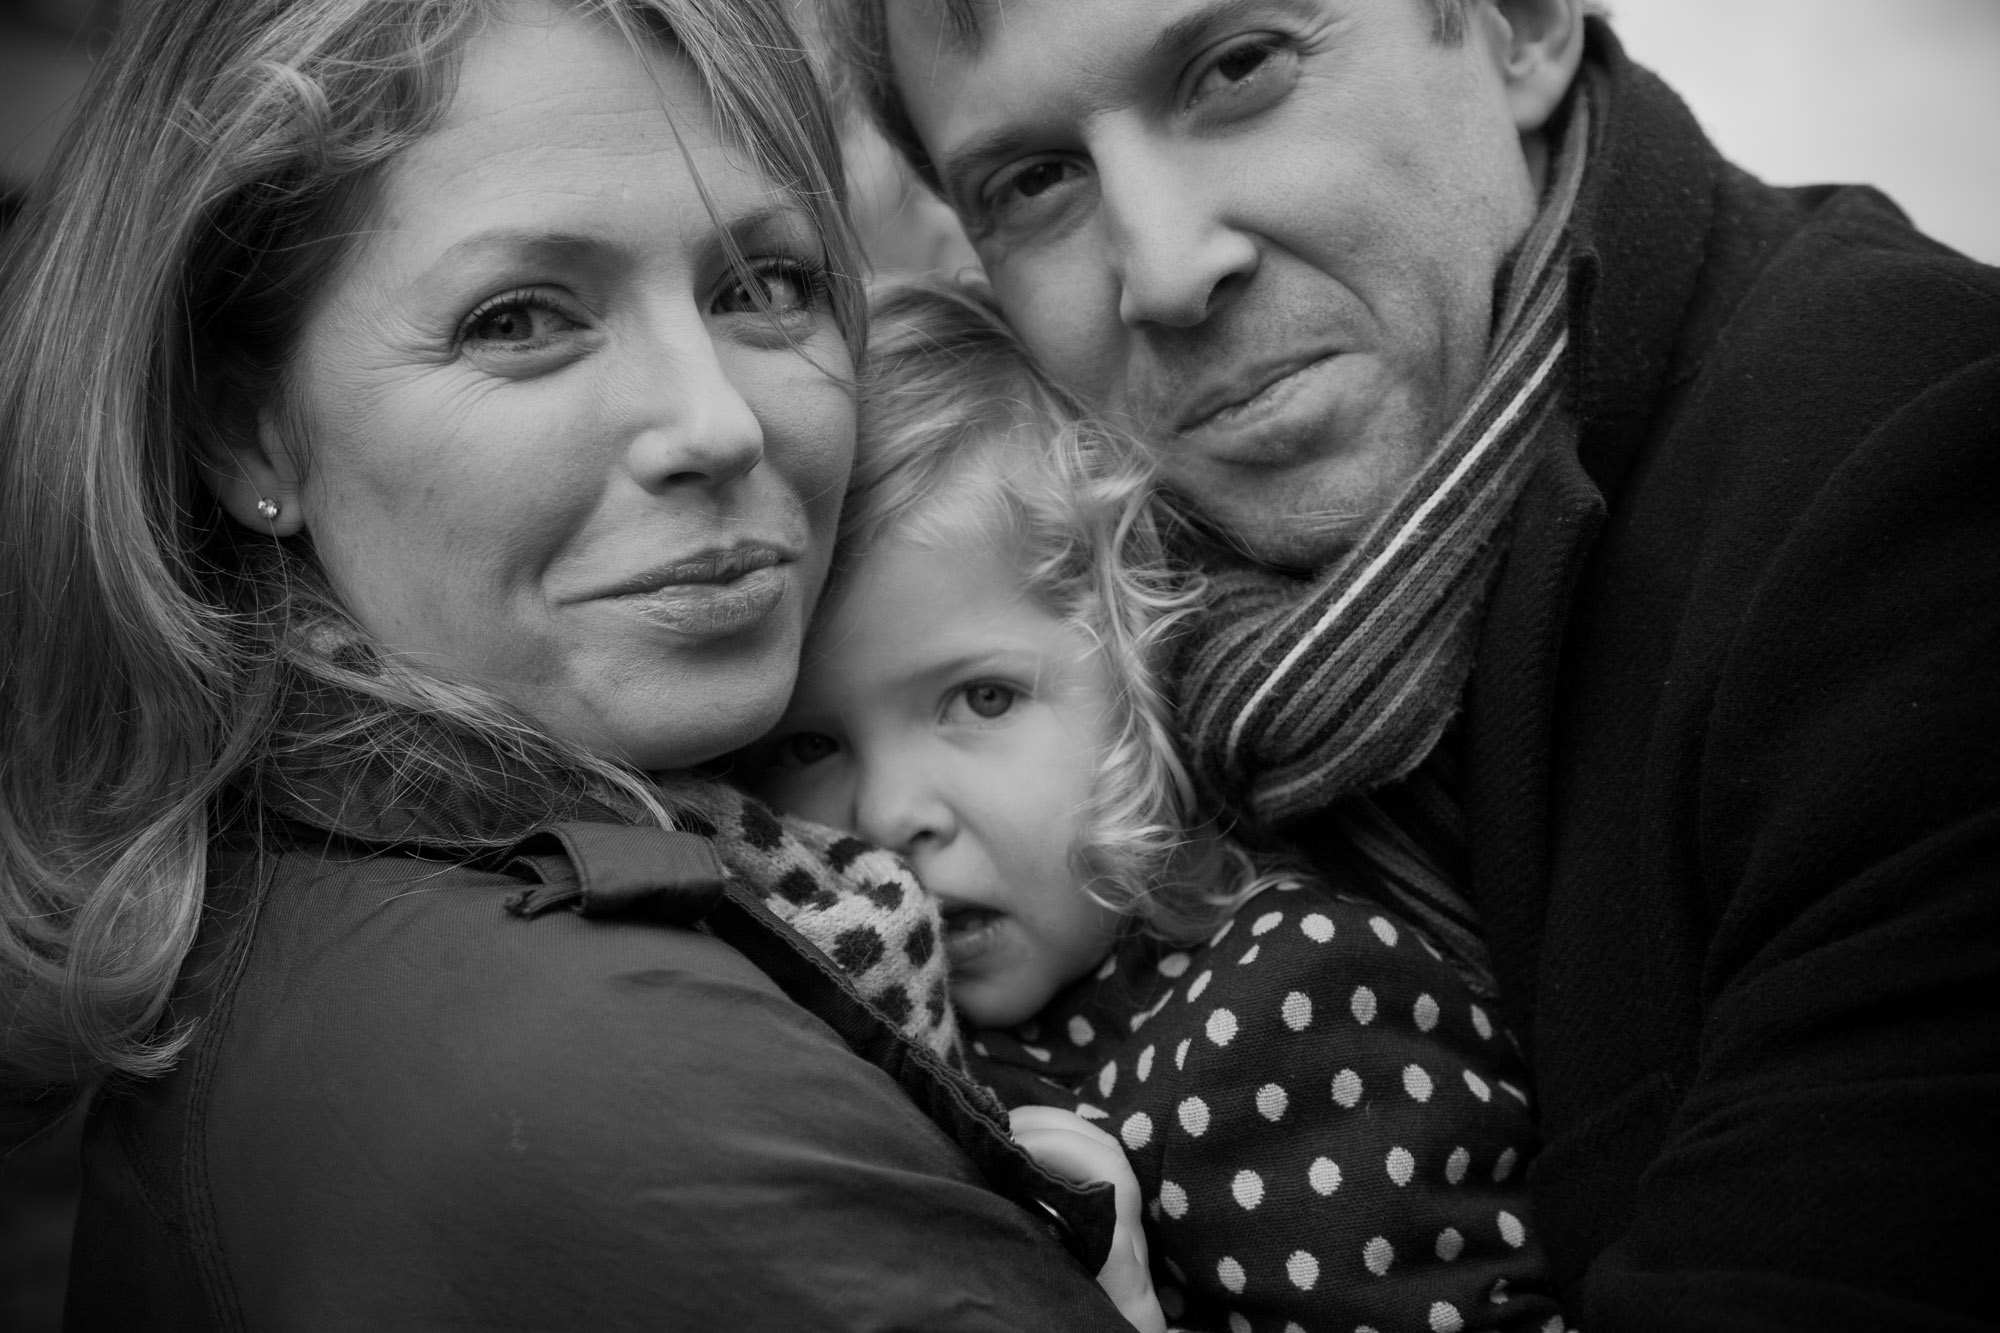 family-life-family-photographer-oxford-london-jonathan-self-photography-33.jpg